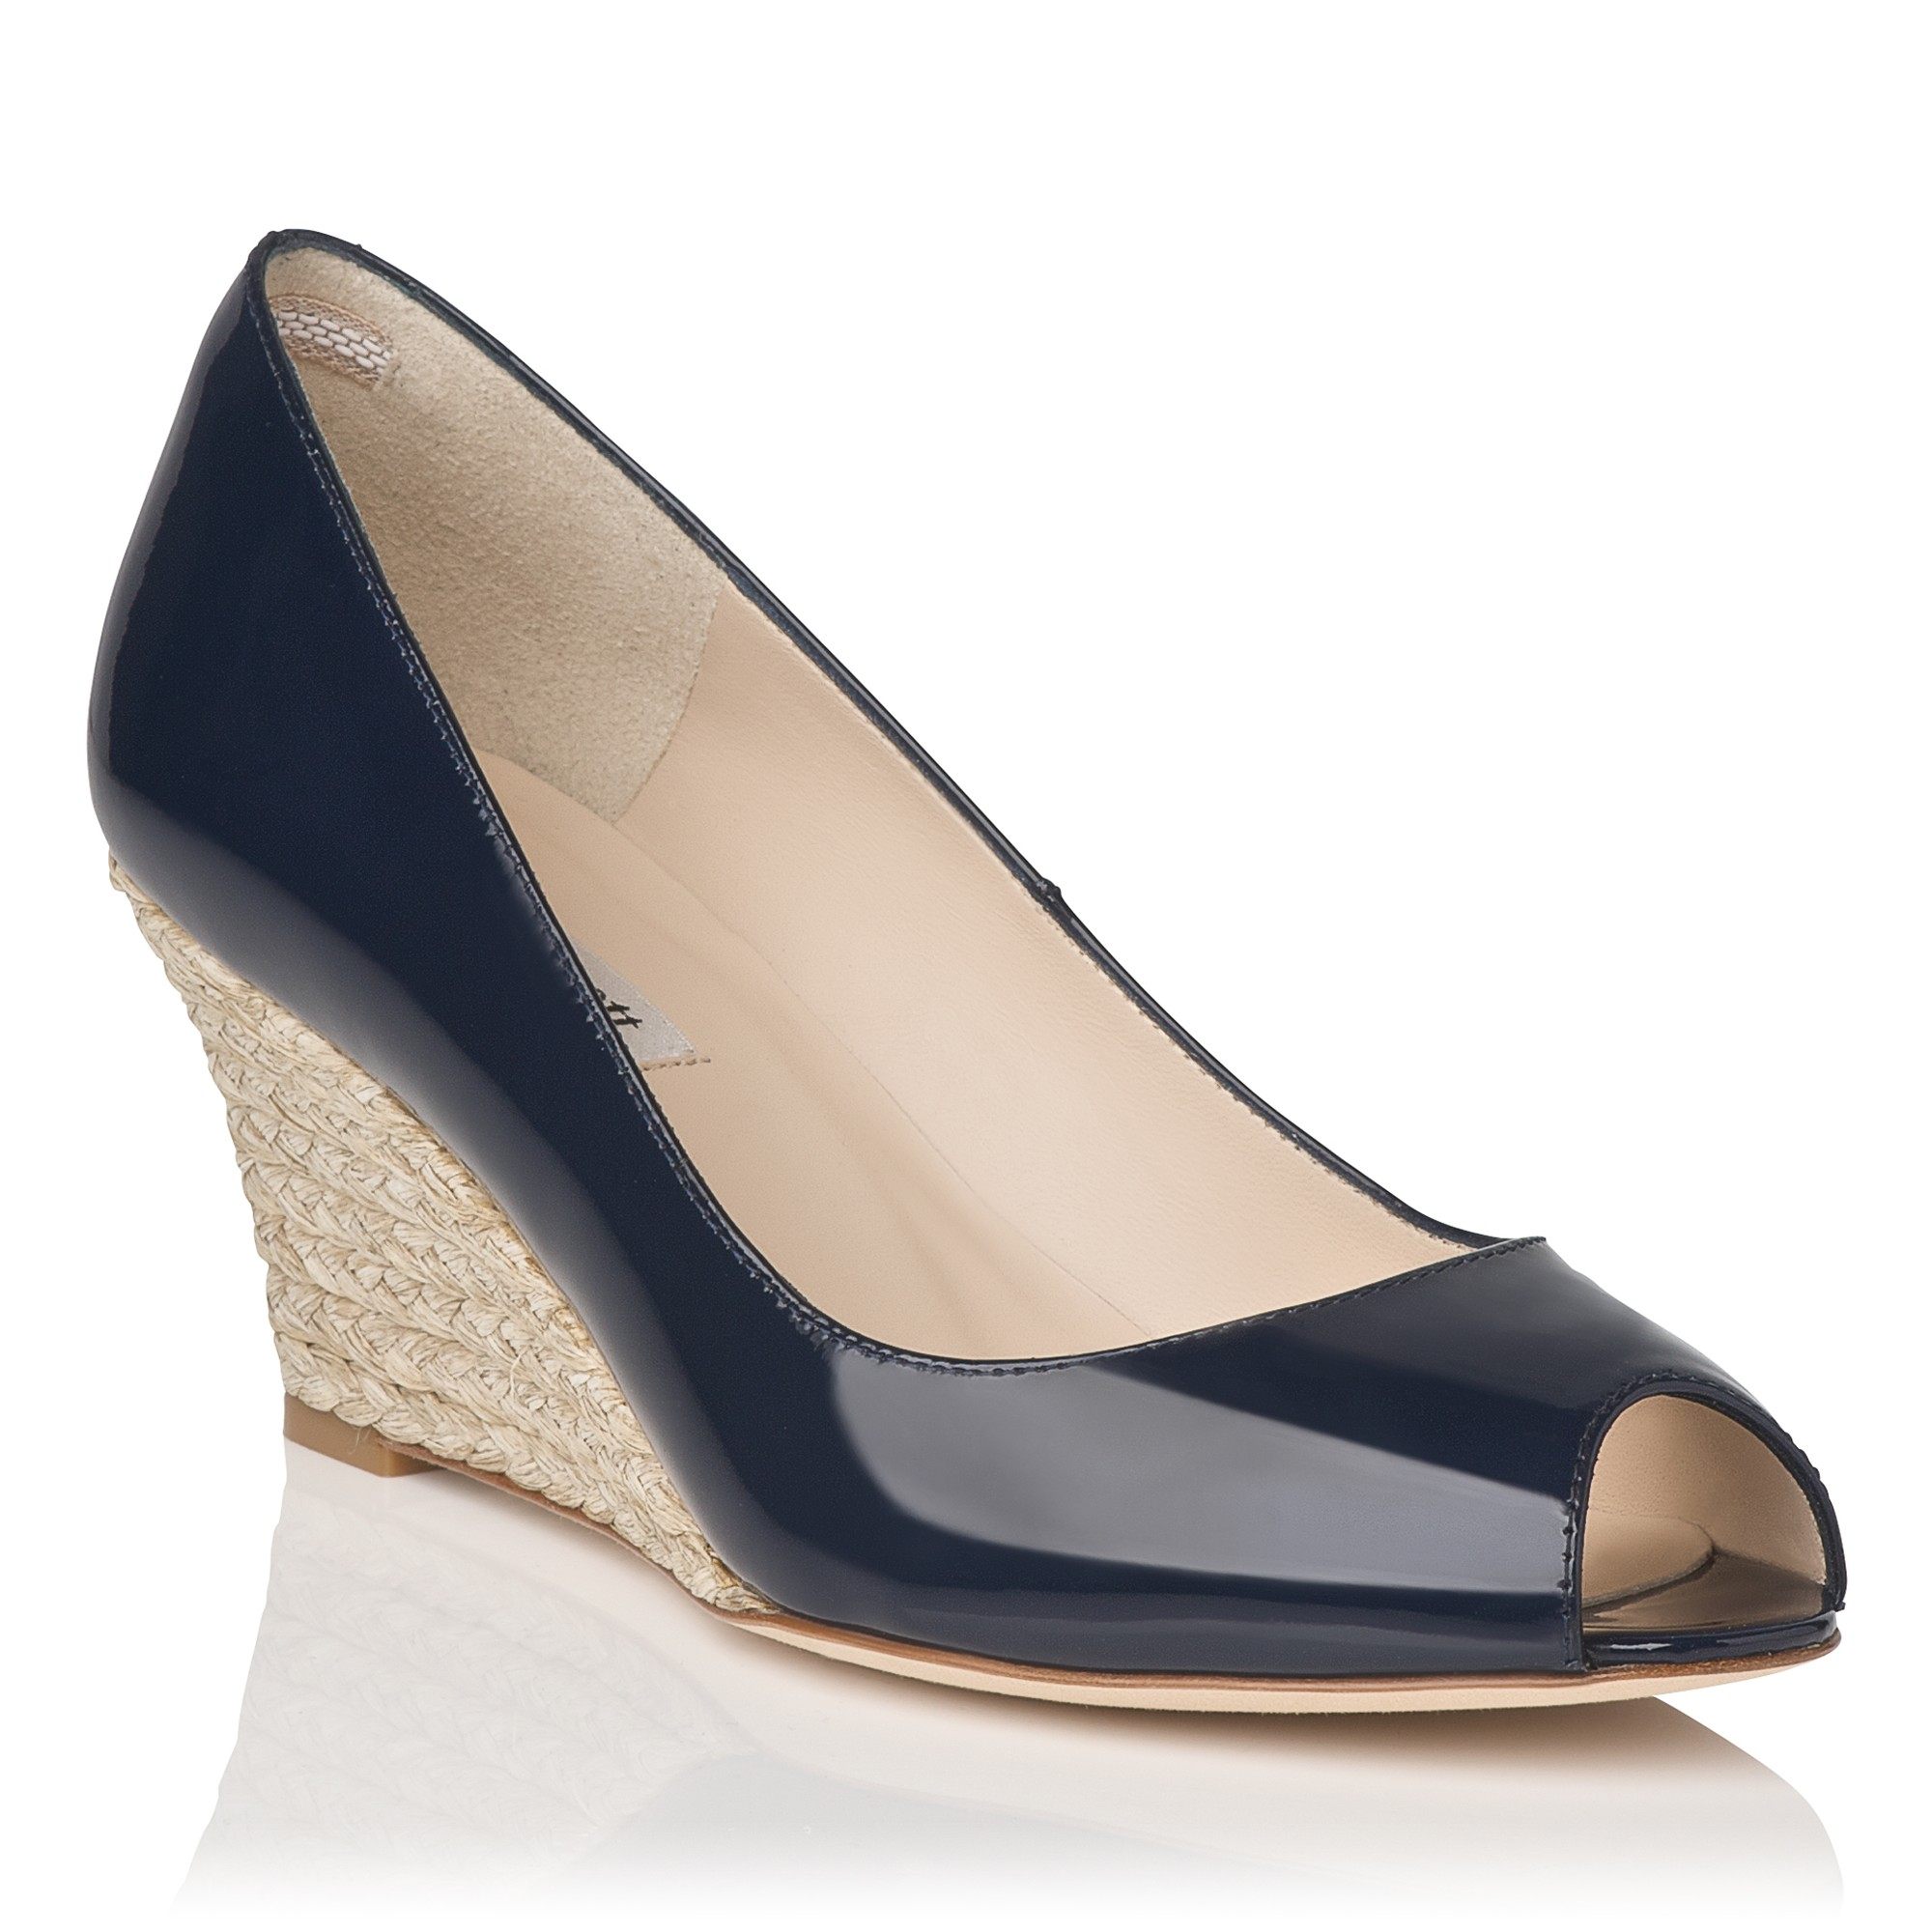 2c772a968088 L.K.Bennett Zelita Patent Leather Peep Toe Wedges in Blue - Lyst